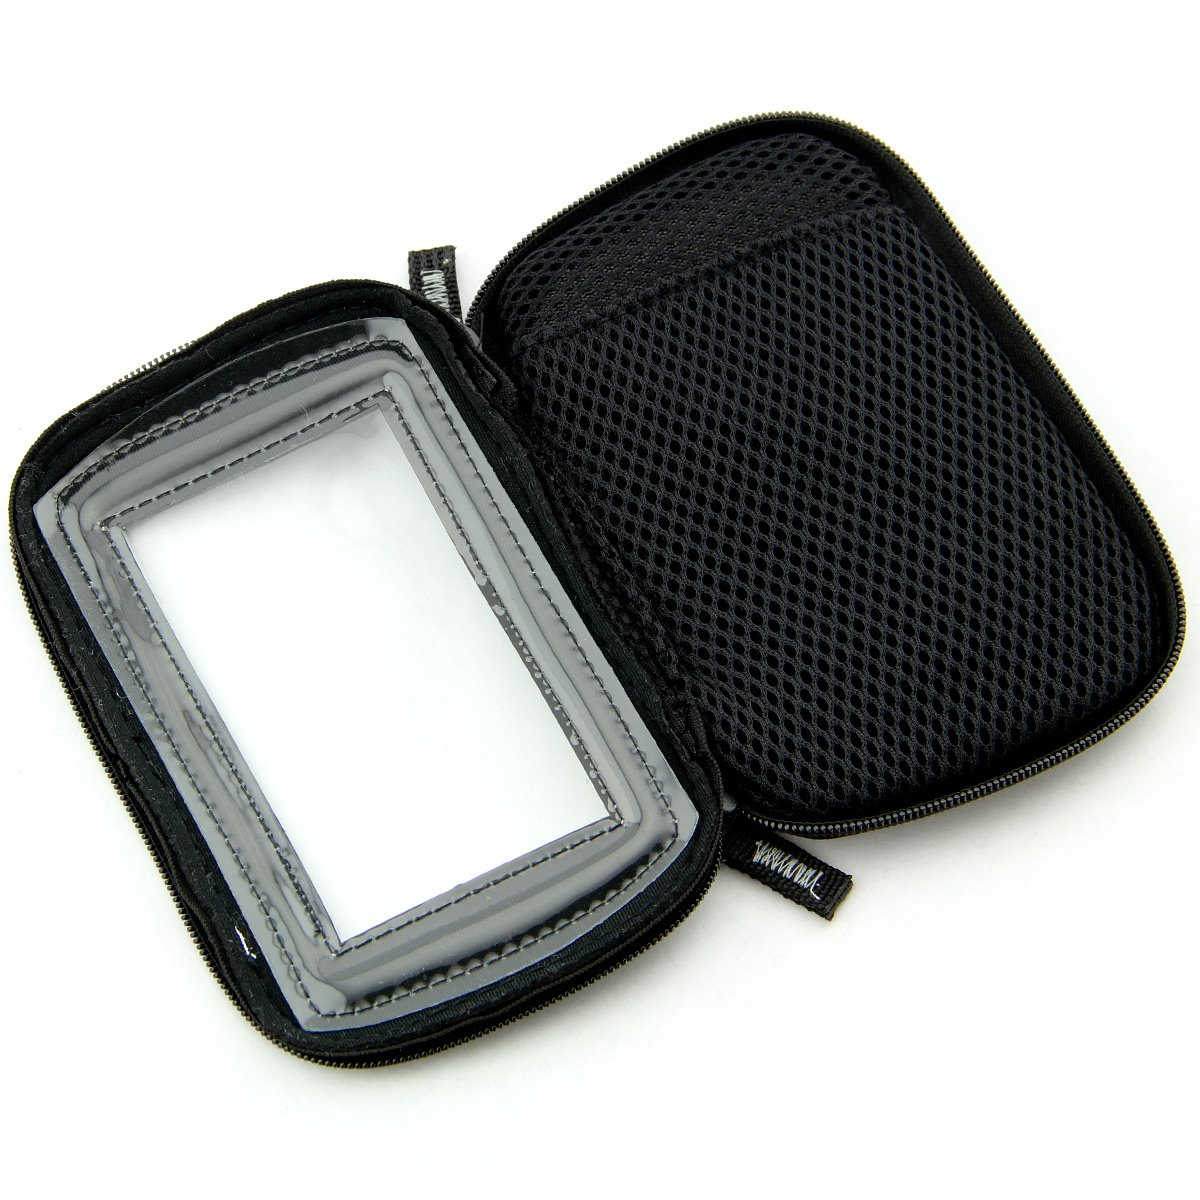 Hawk Helmets Tech Small Magnetic Tank Bag/Phone Case - Small by Hawk Helmets (Image #4)